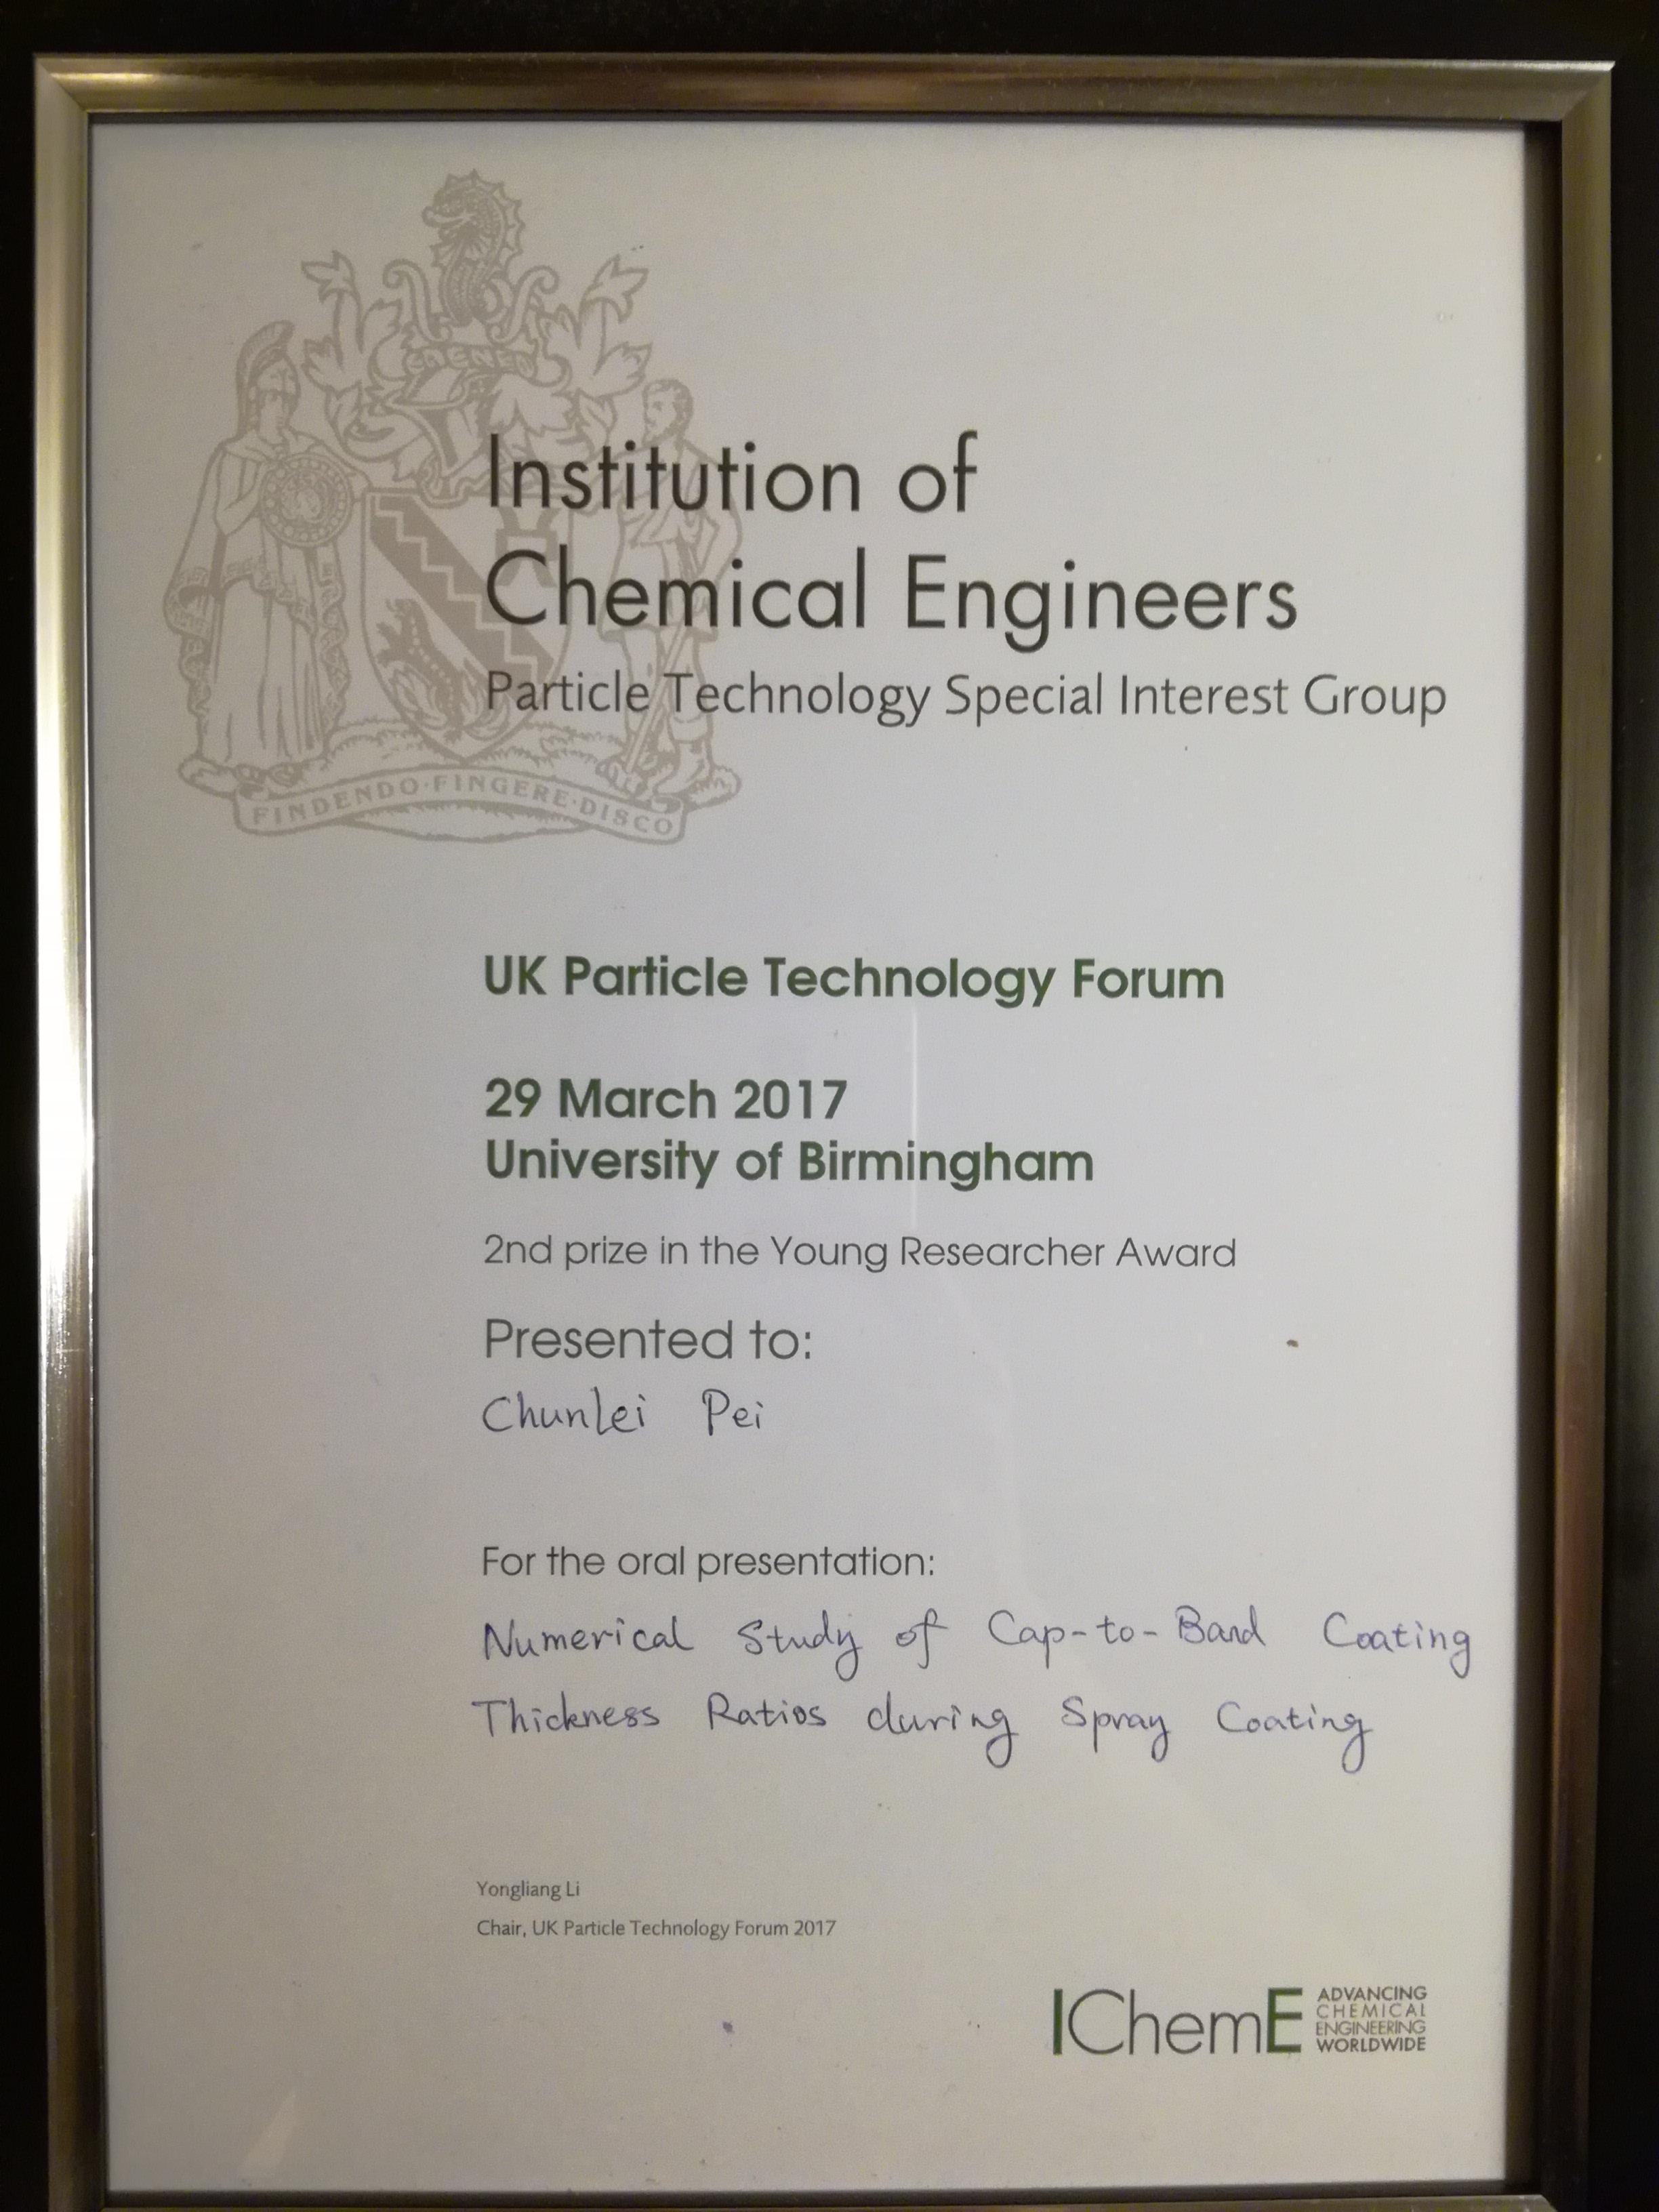 Congratulations to Dr Chunlei Pei